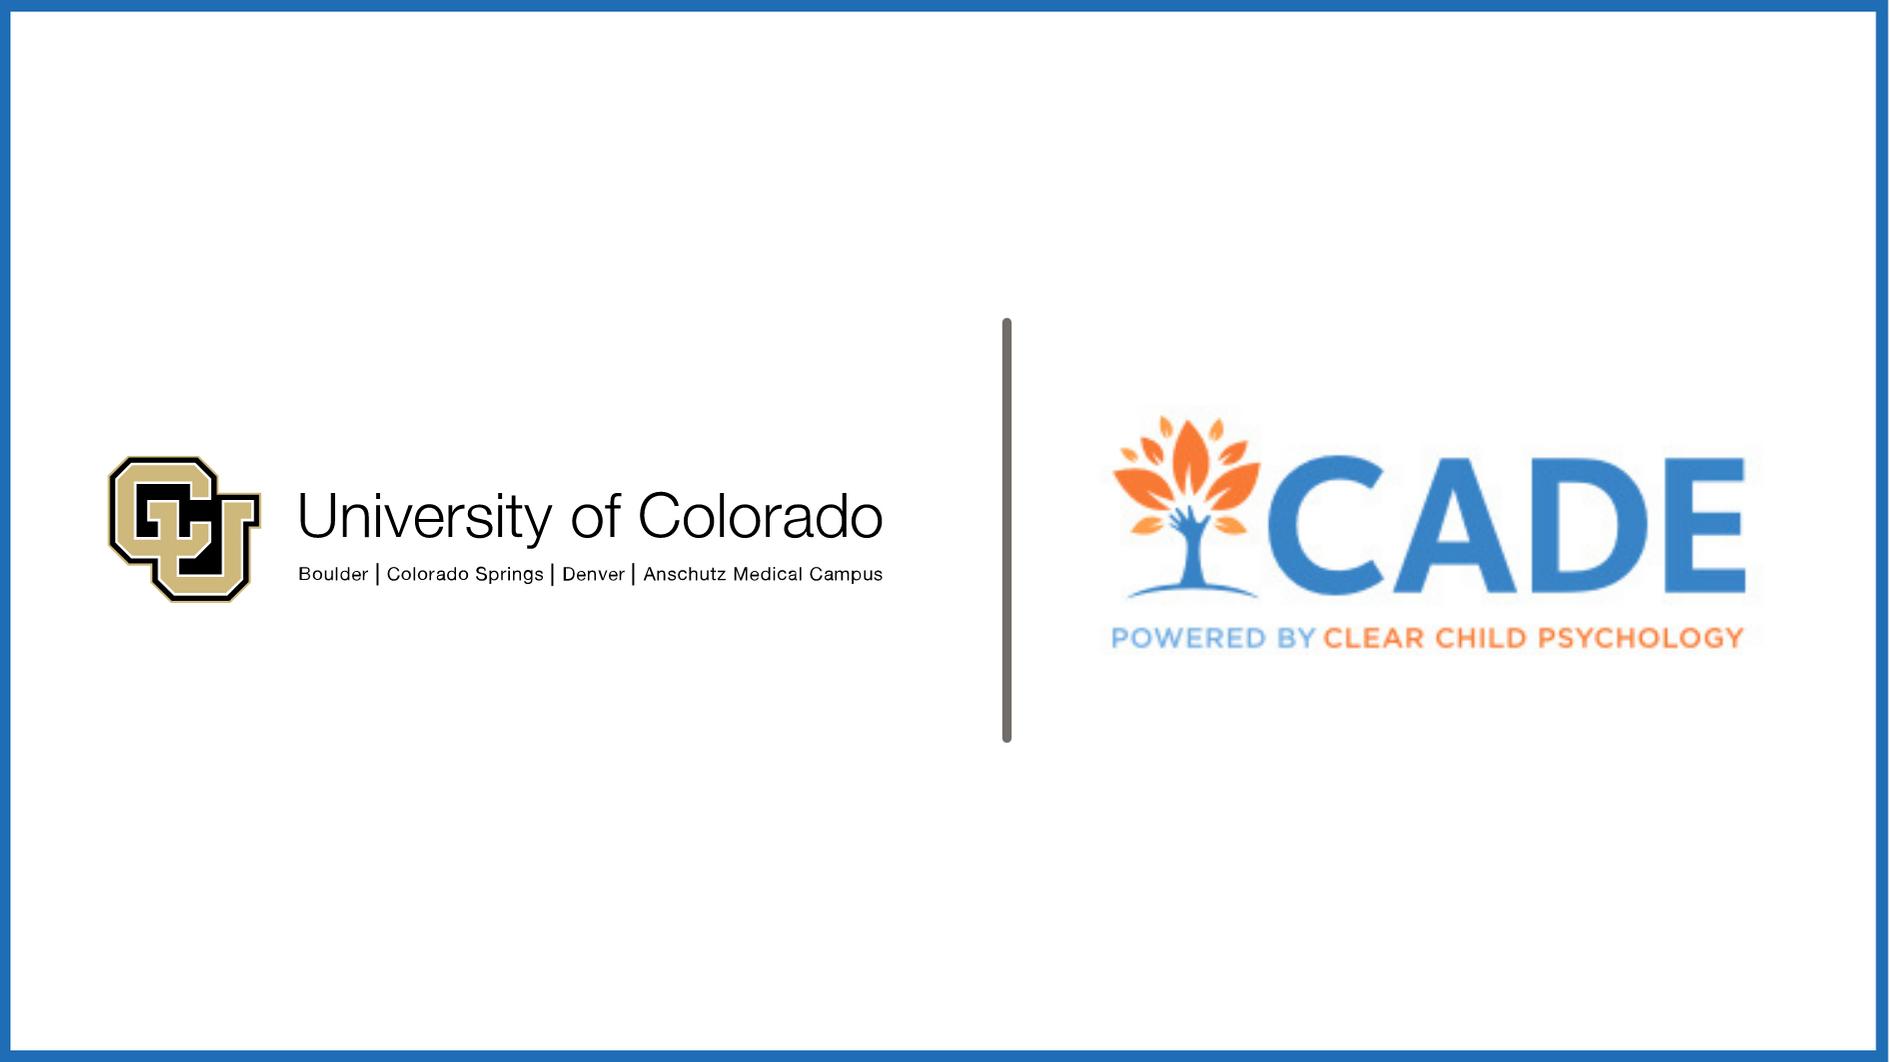 The University of Colorado studies CADE